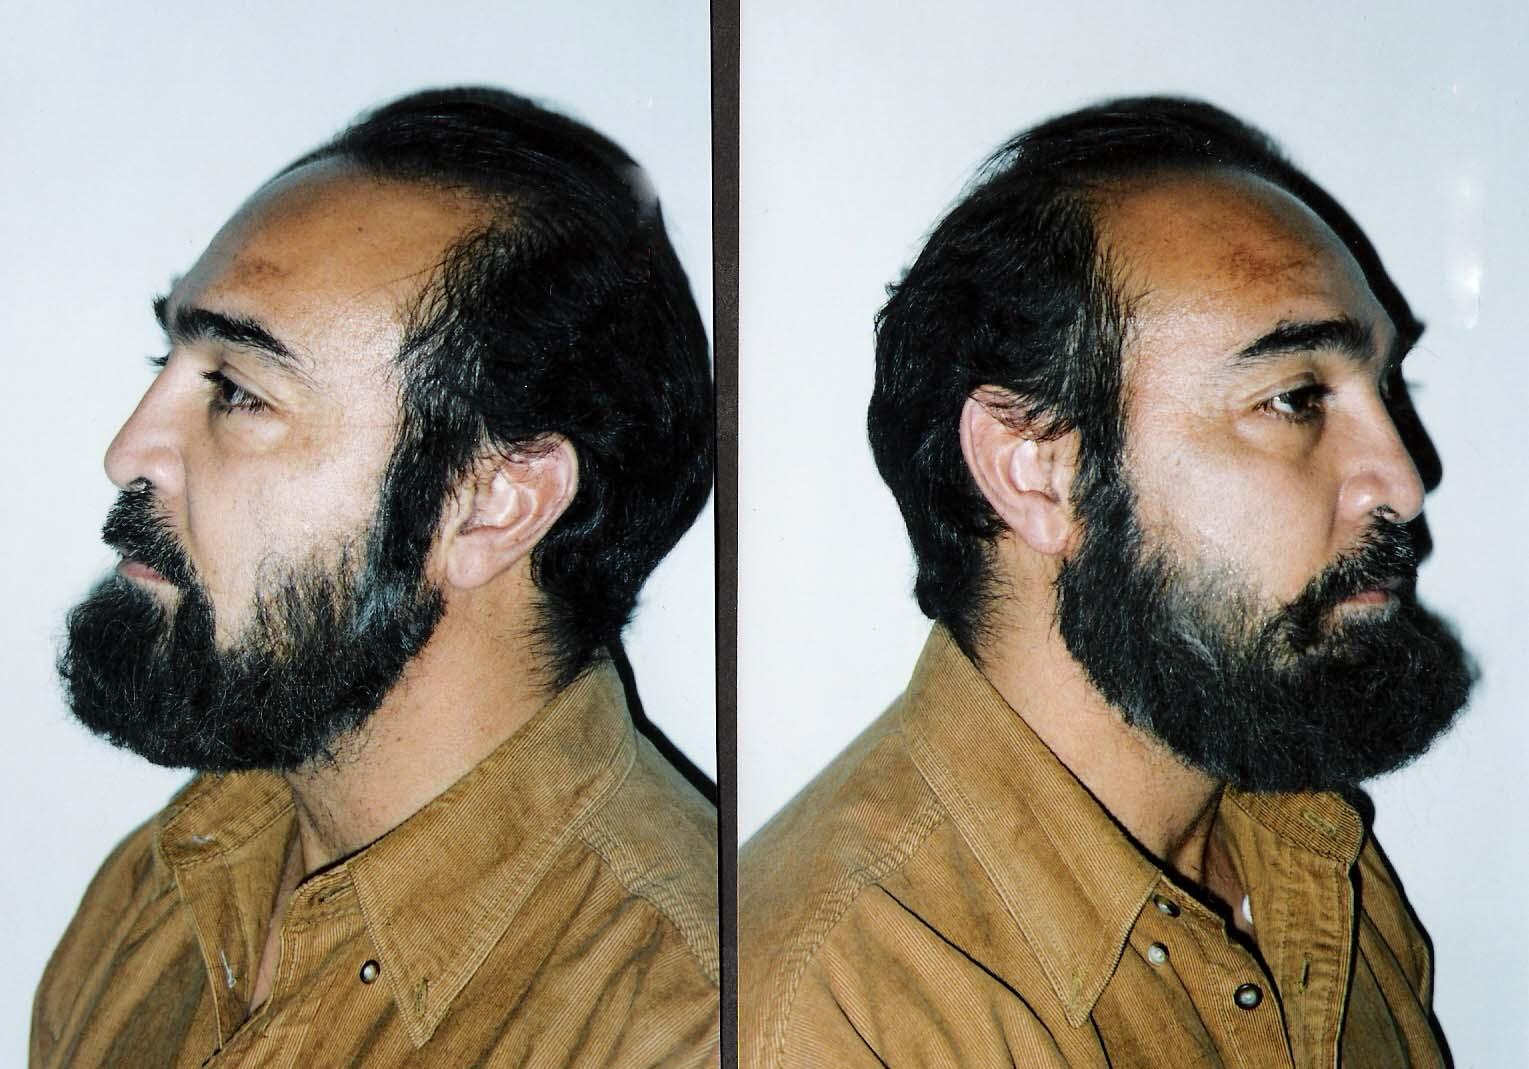 Hand laid full beard